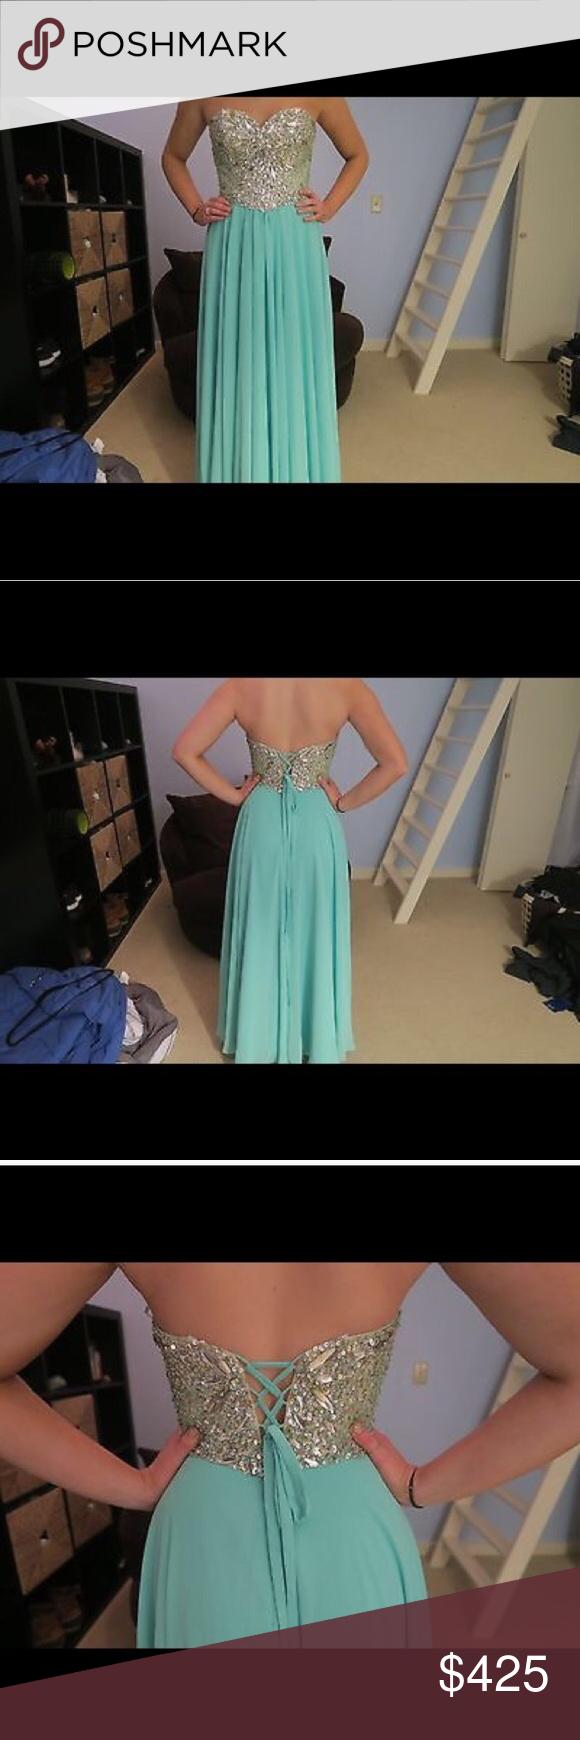 Authentic terani prom dress